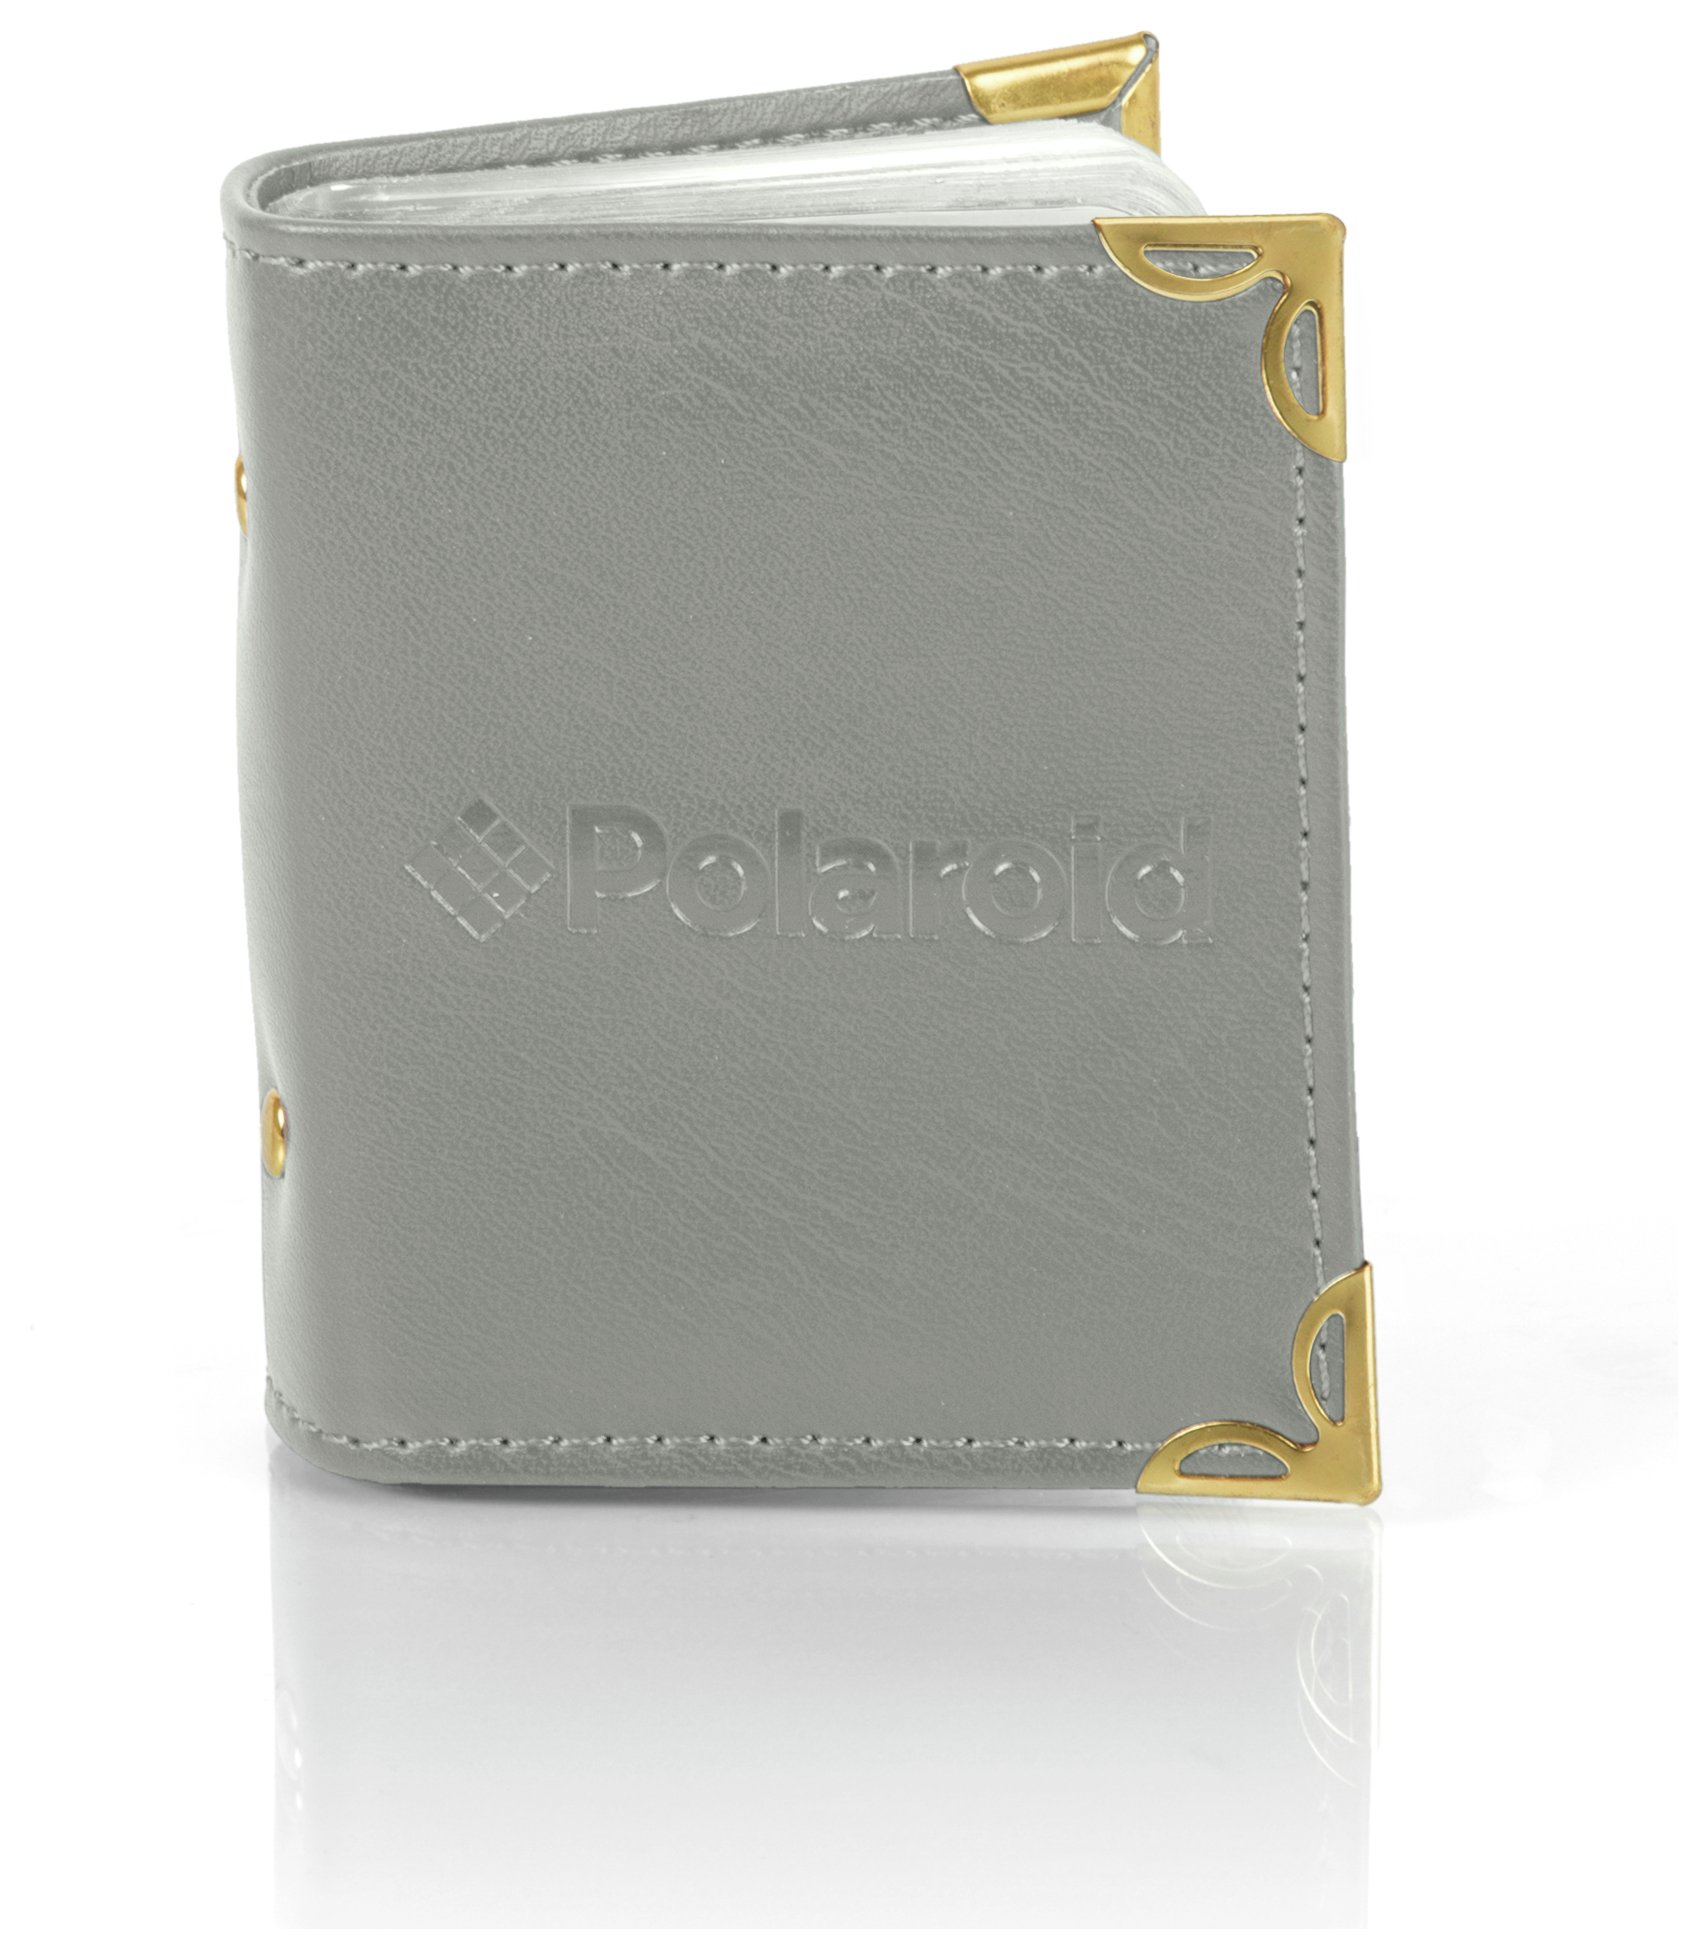 leatherette-photo-album-2x3-inch-grey